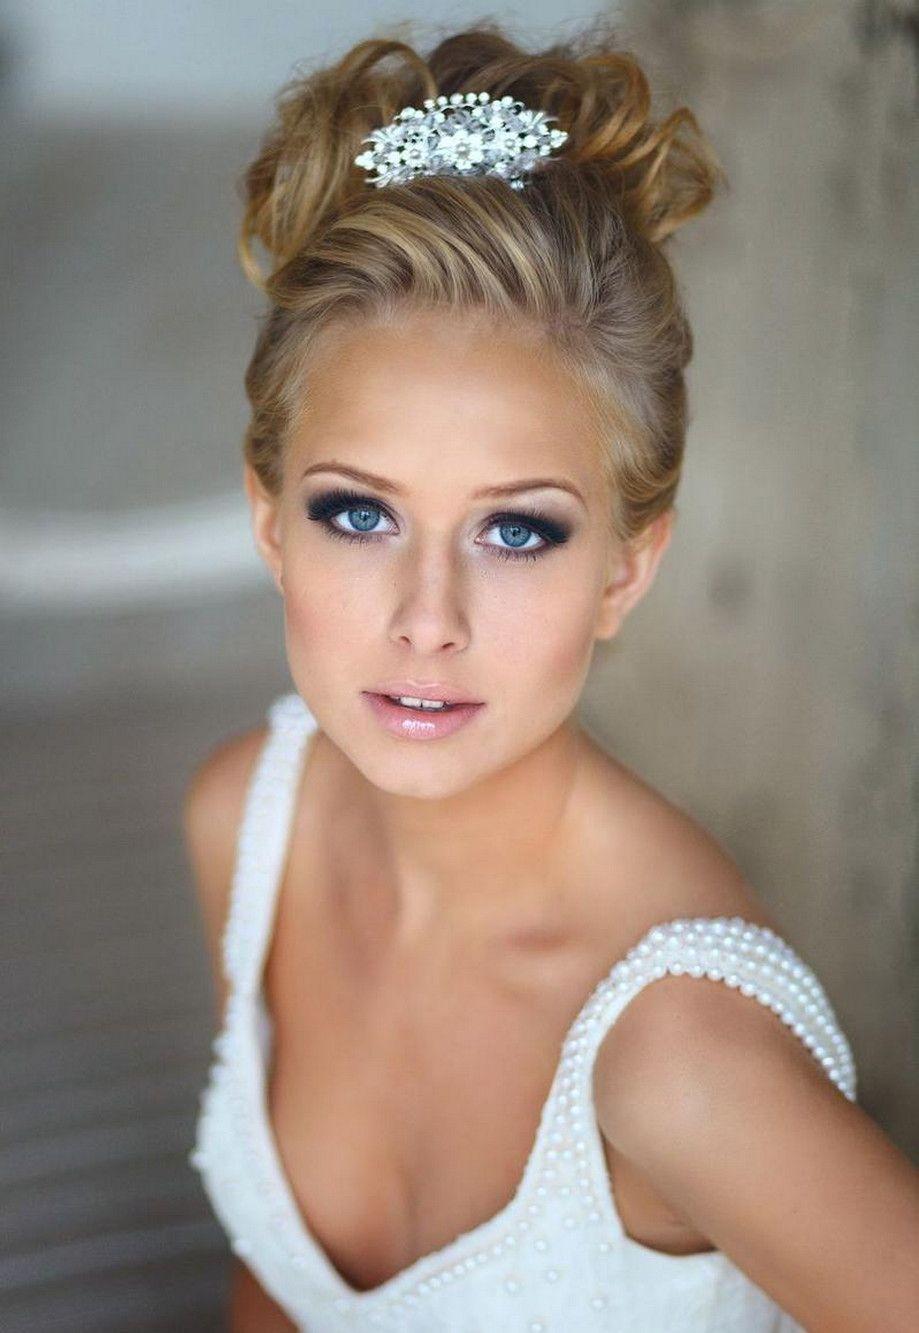 15 Smokey Eye Makeup For Blue Eyes And Blonde Hair Ideas